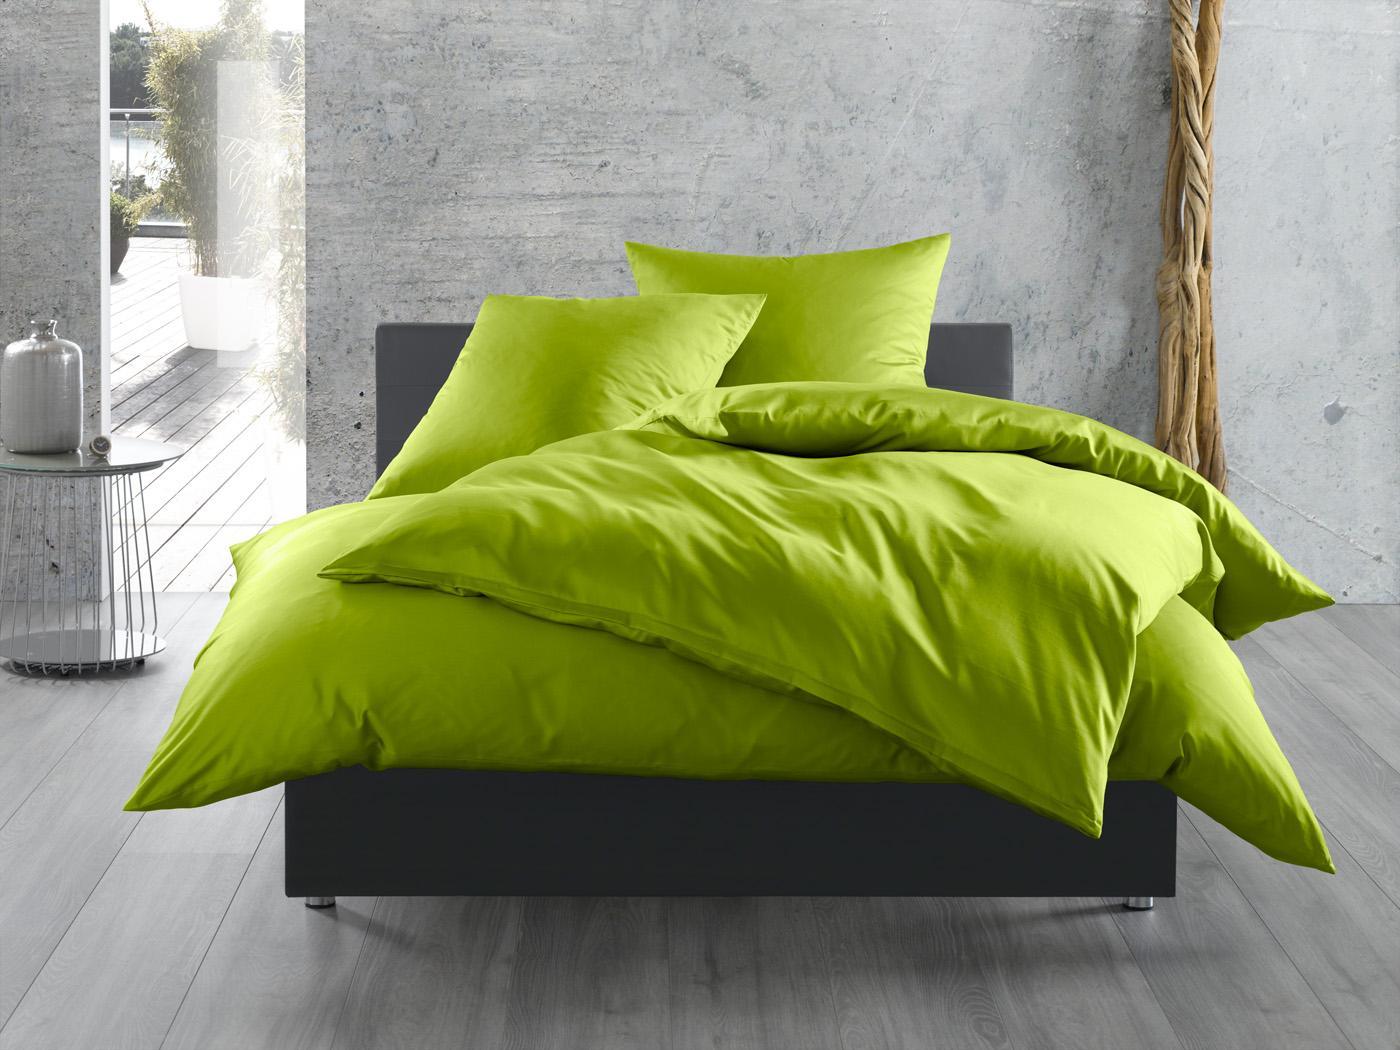 Mako Satin Bettwäsche uni grün 140x200